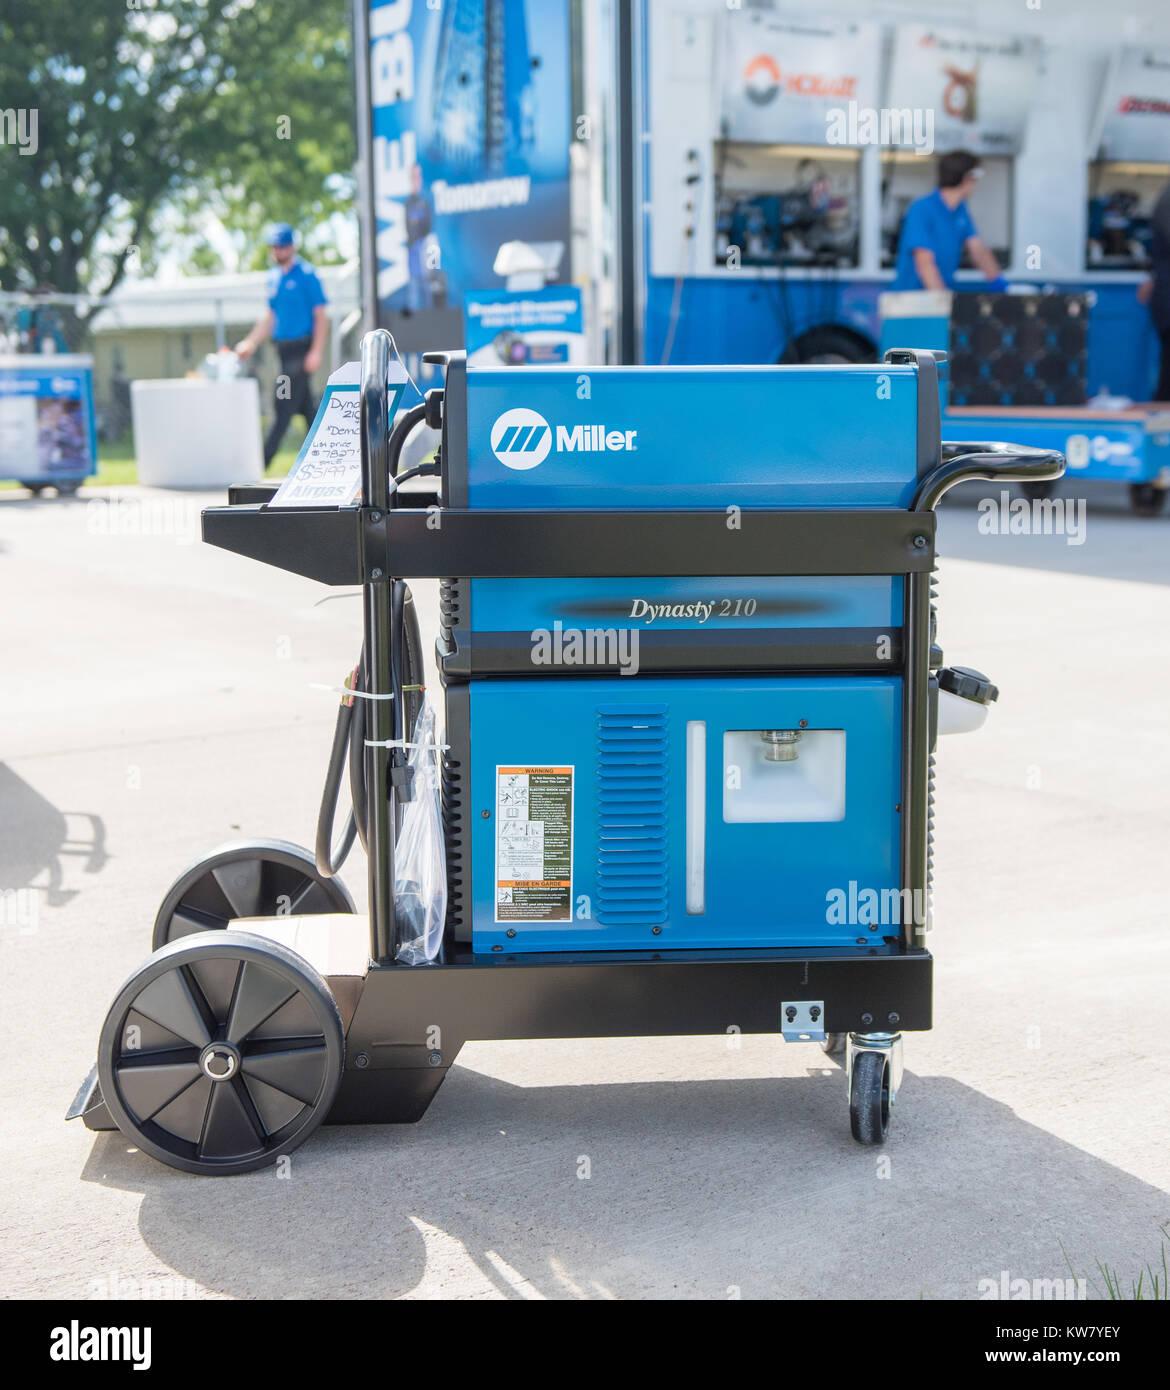 Oshkosh, WI - 24 July 2017:  A Miller welder machine on display - Stock Image